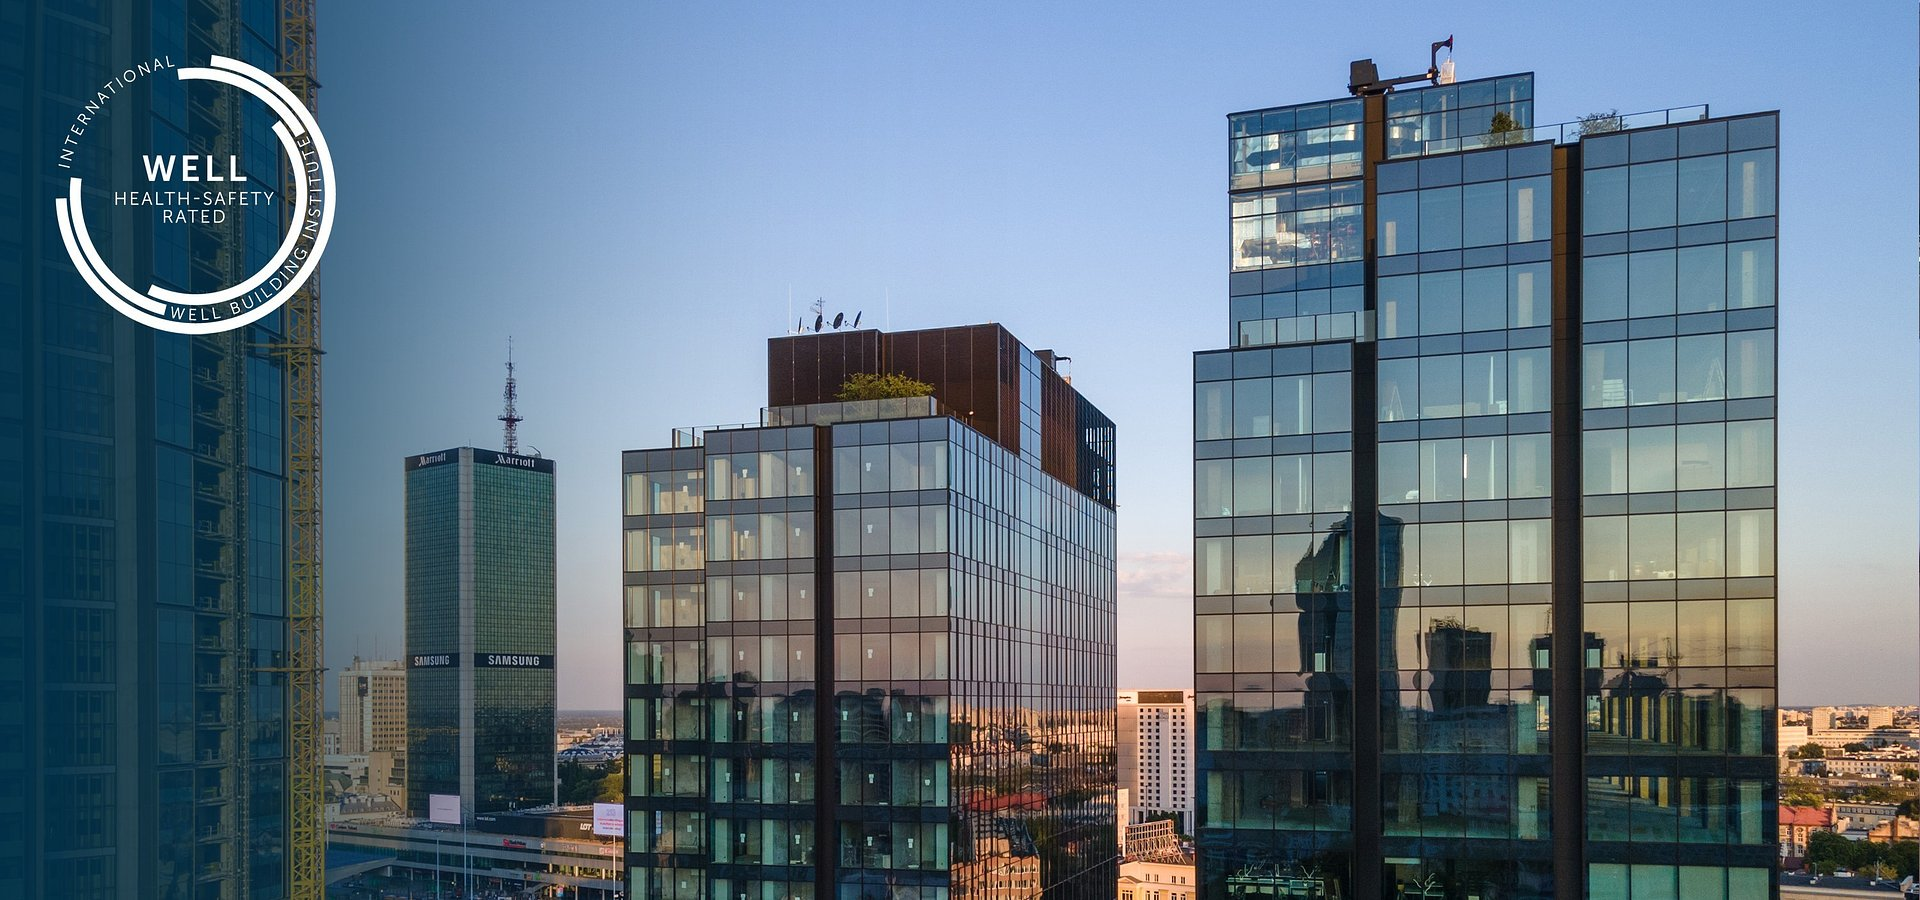 Varso Place mit dem neuen WELL Health-Safety Rating akkreditiert